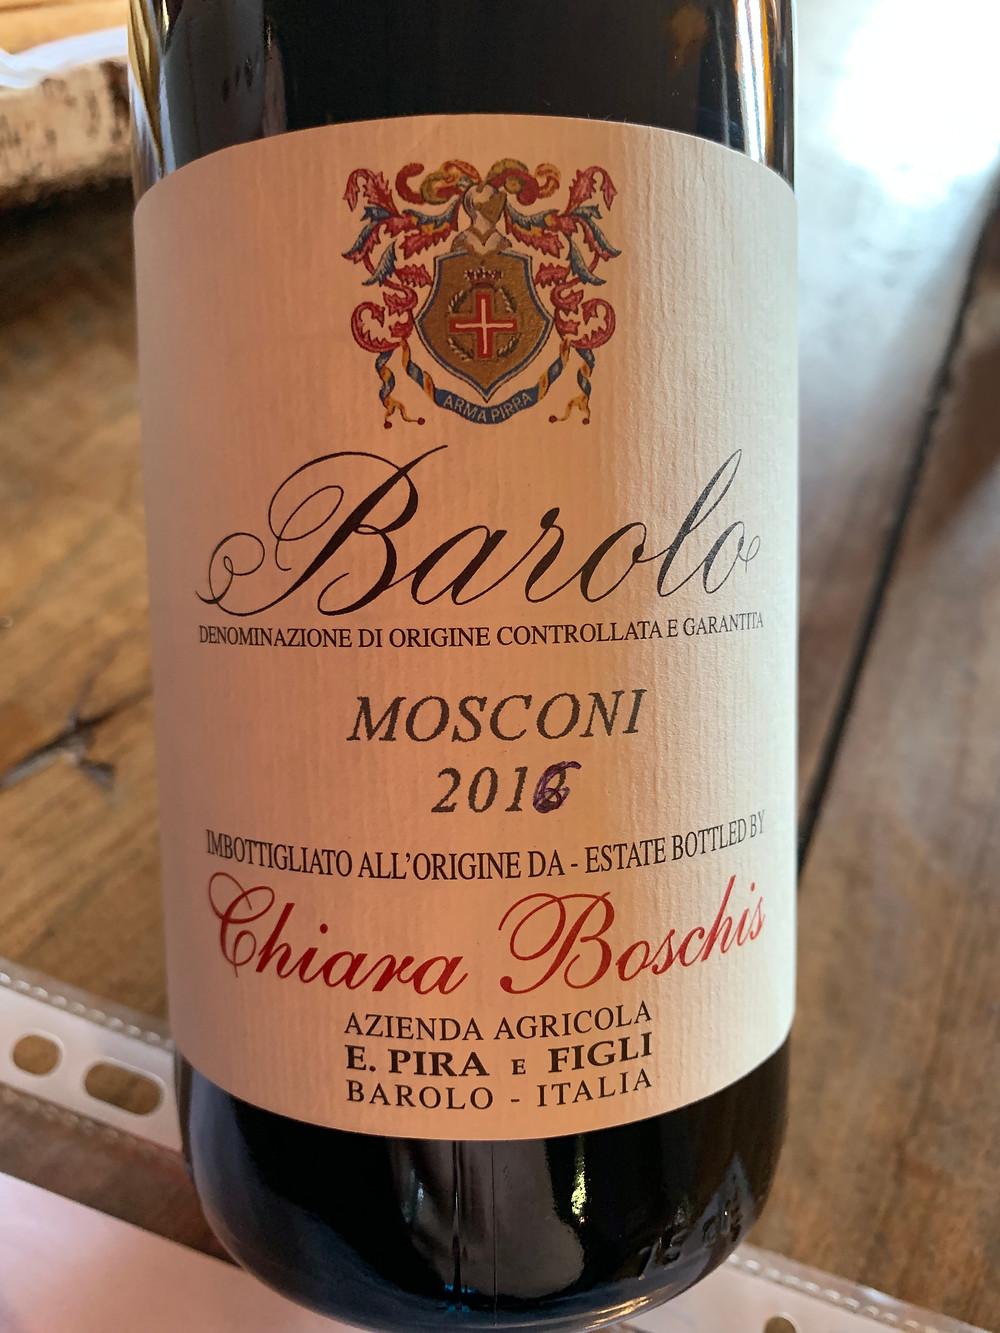 Chiara Boschis, Barolo, Piemonte